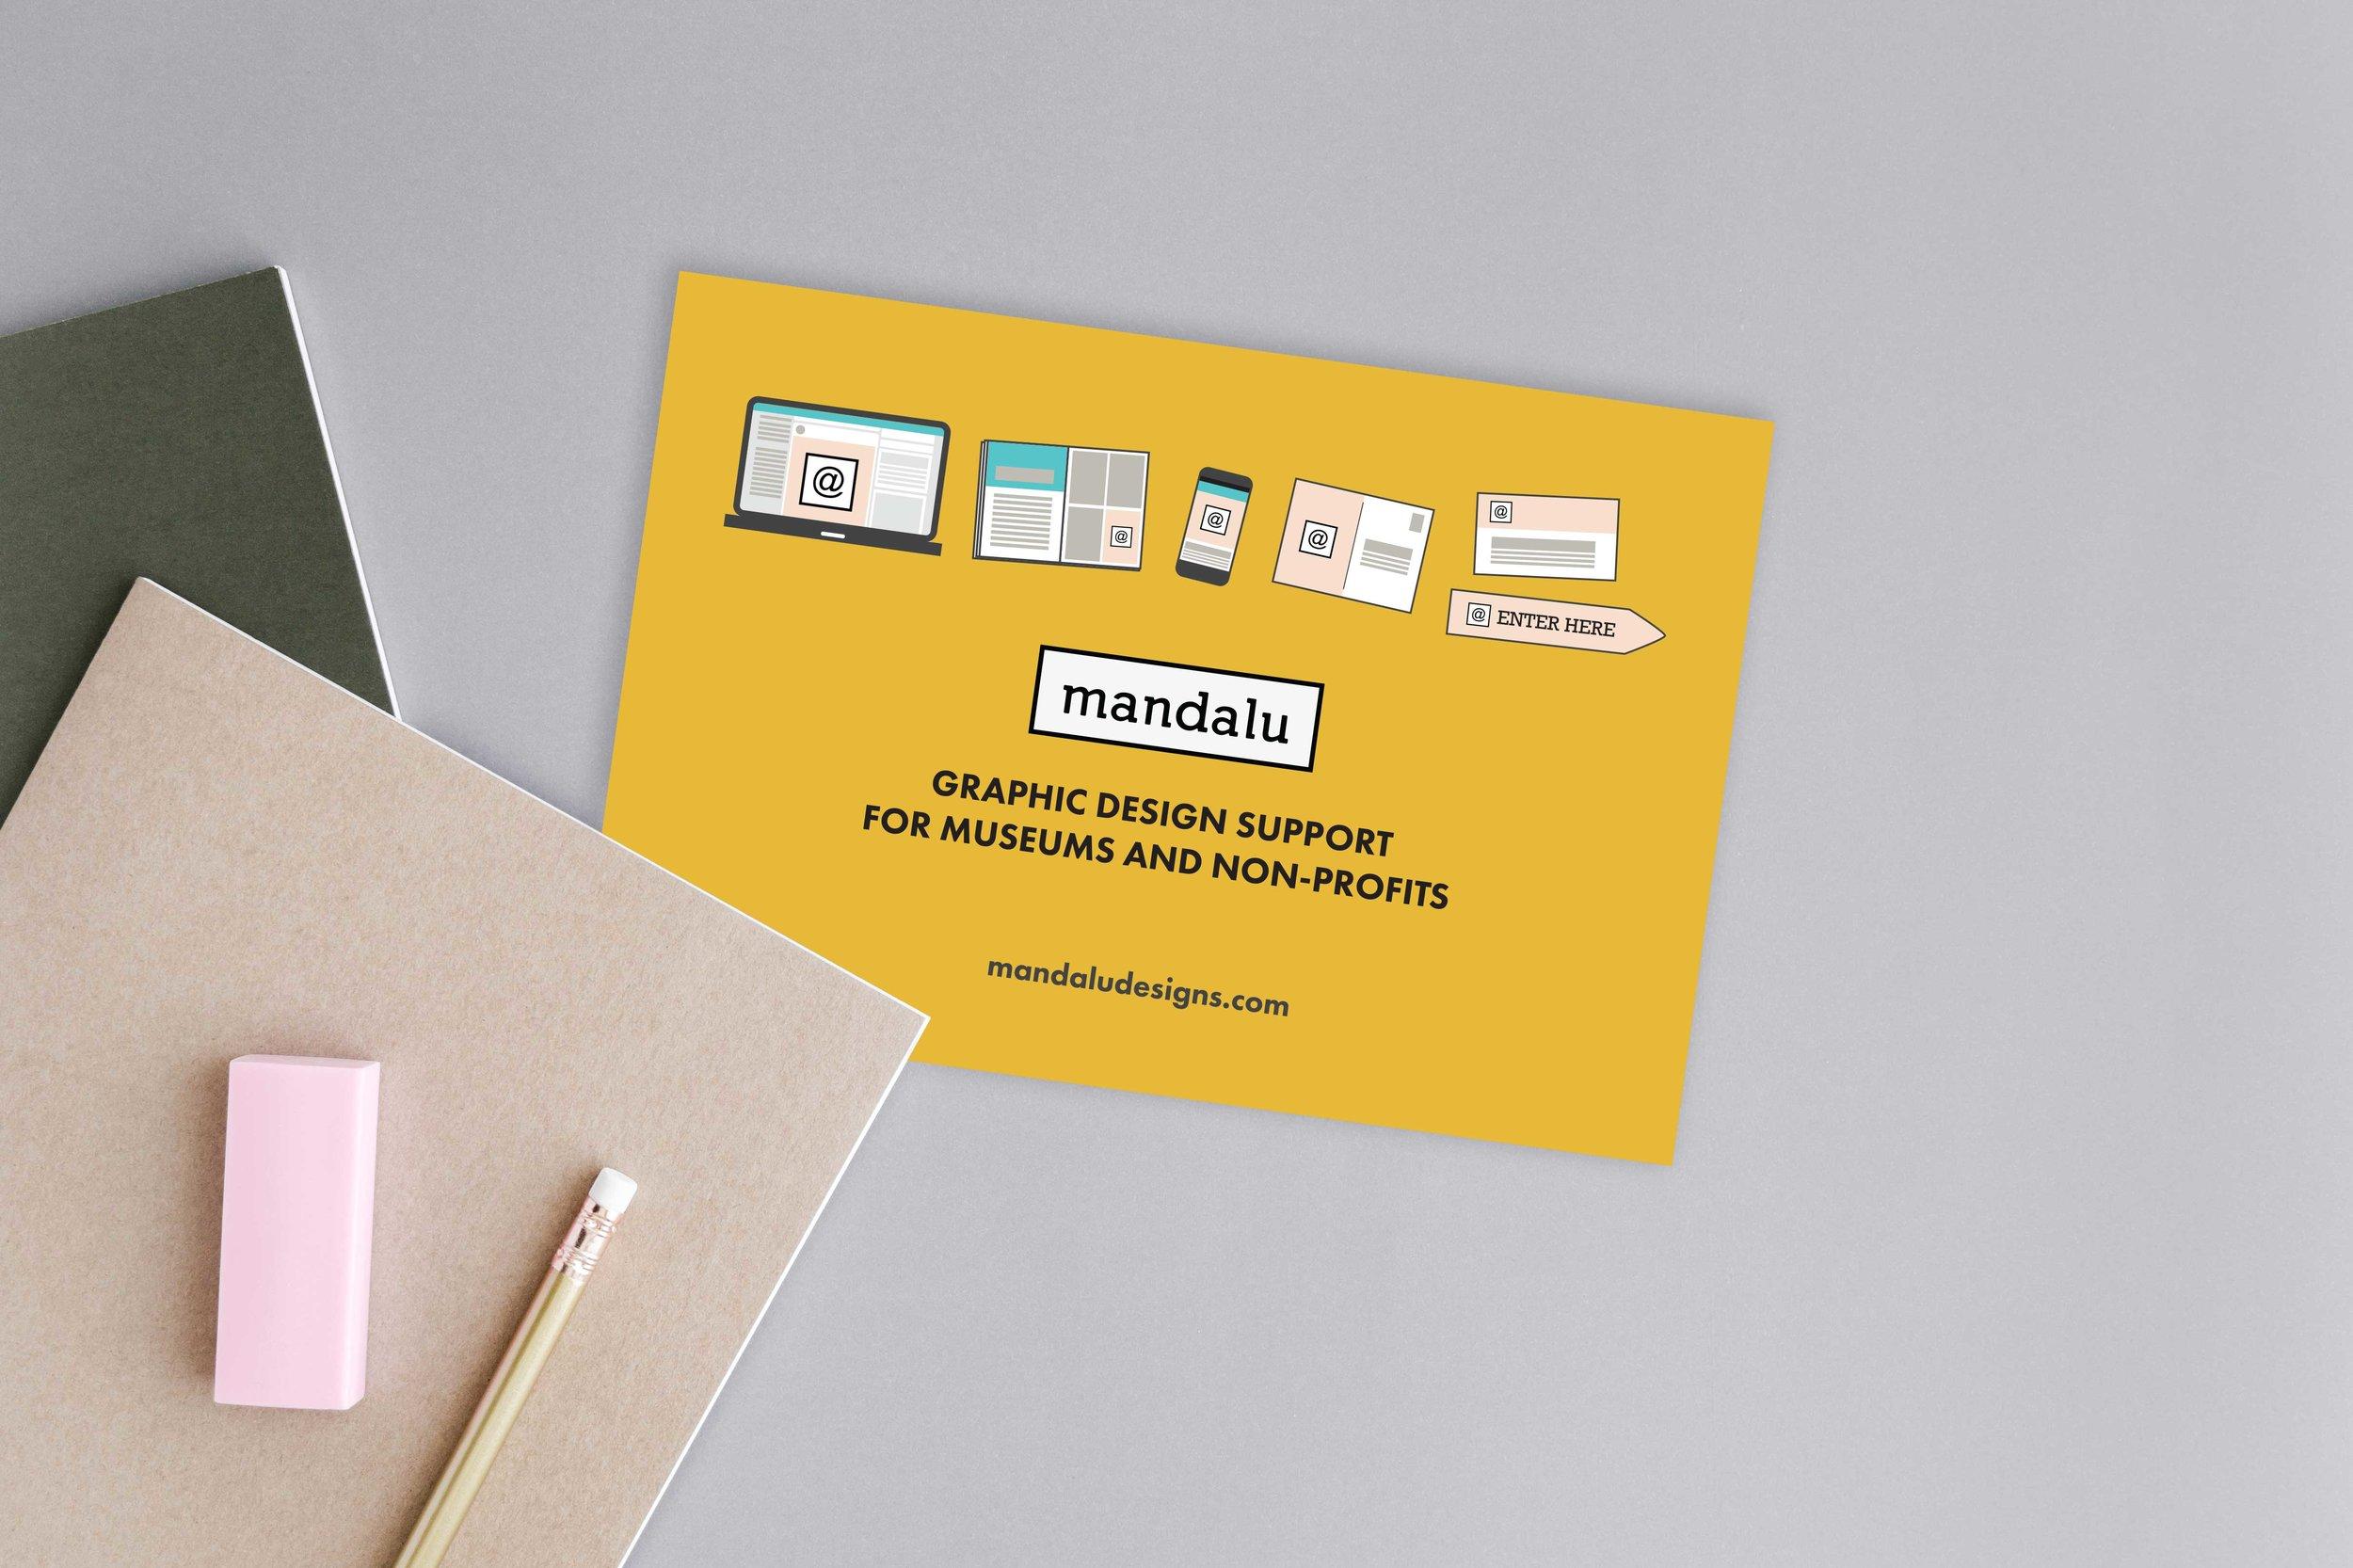 mandaludesigns_postcard-graphic-design